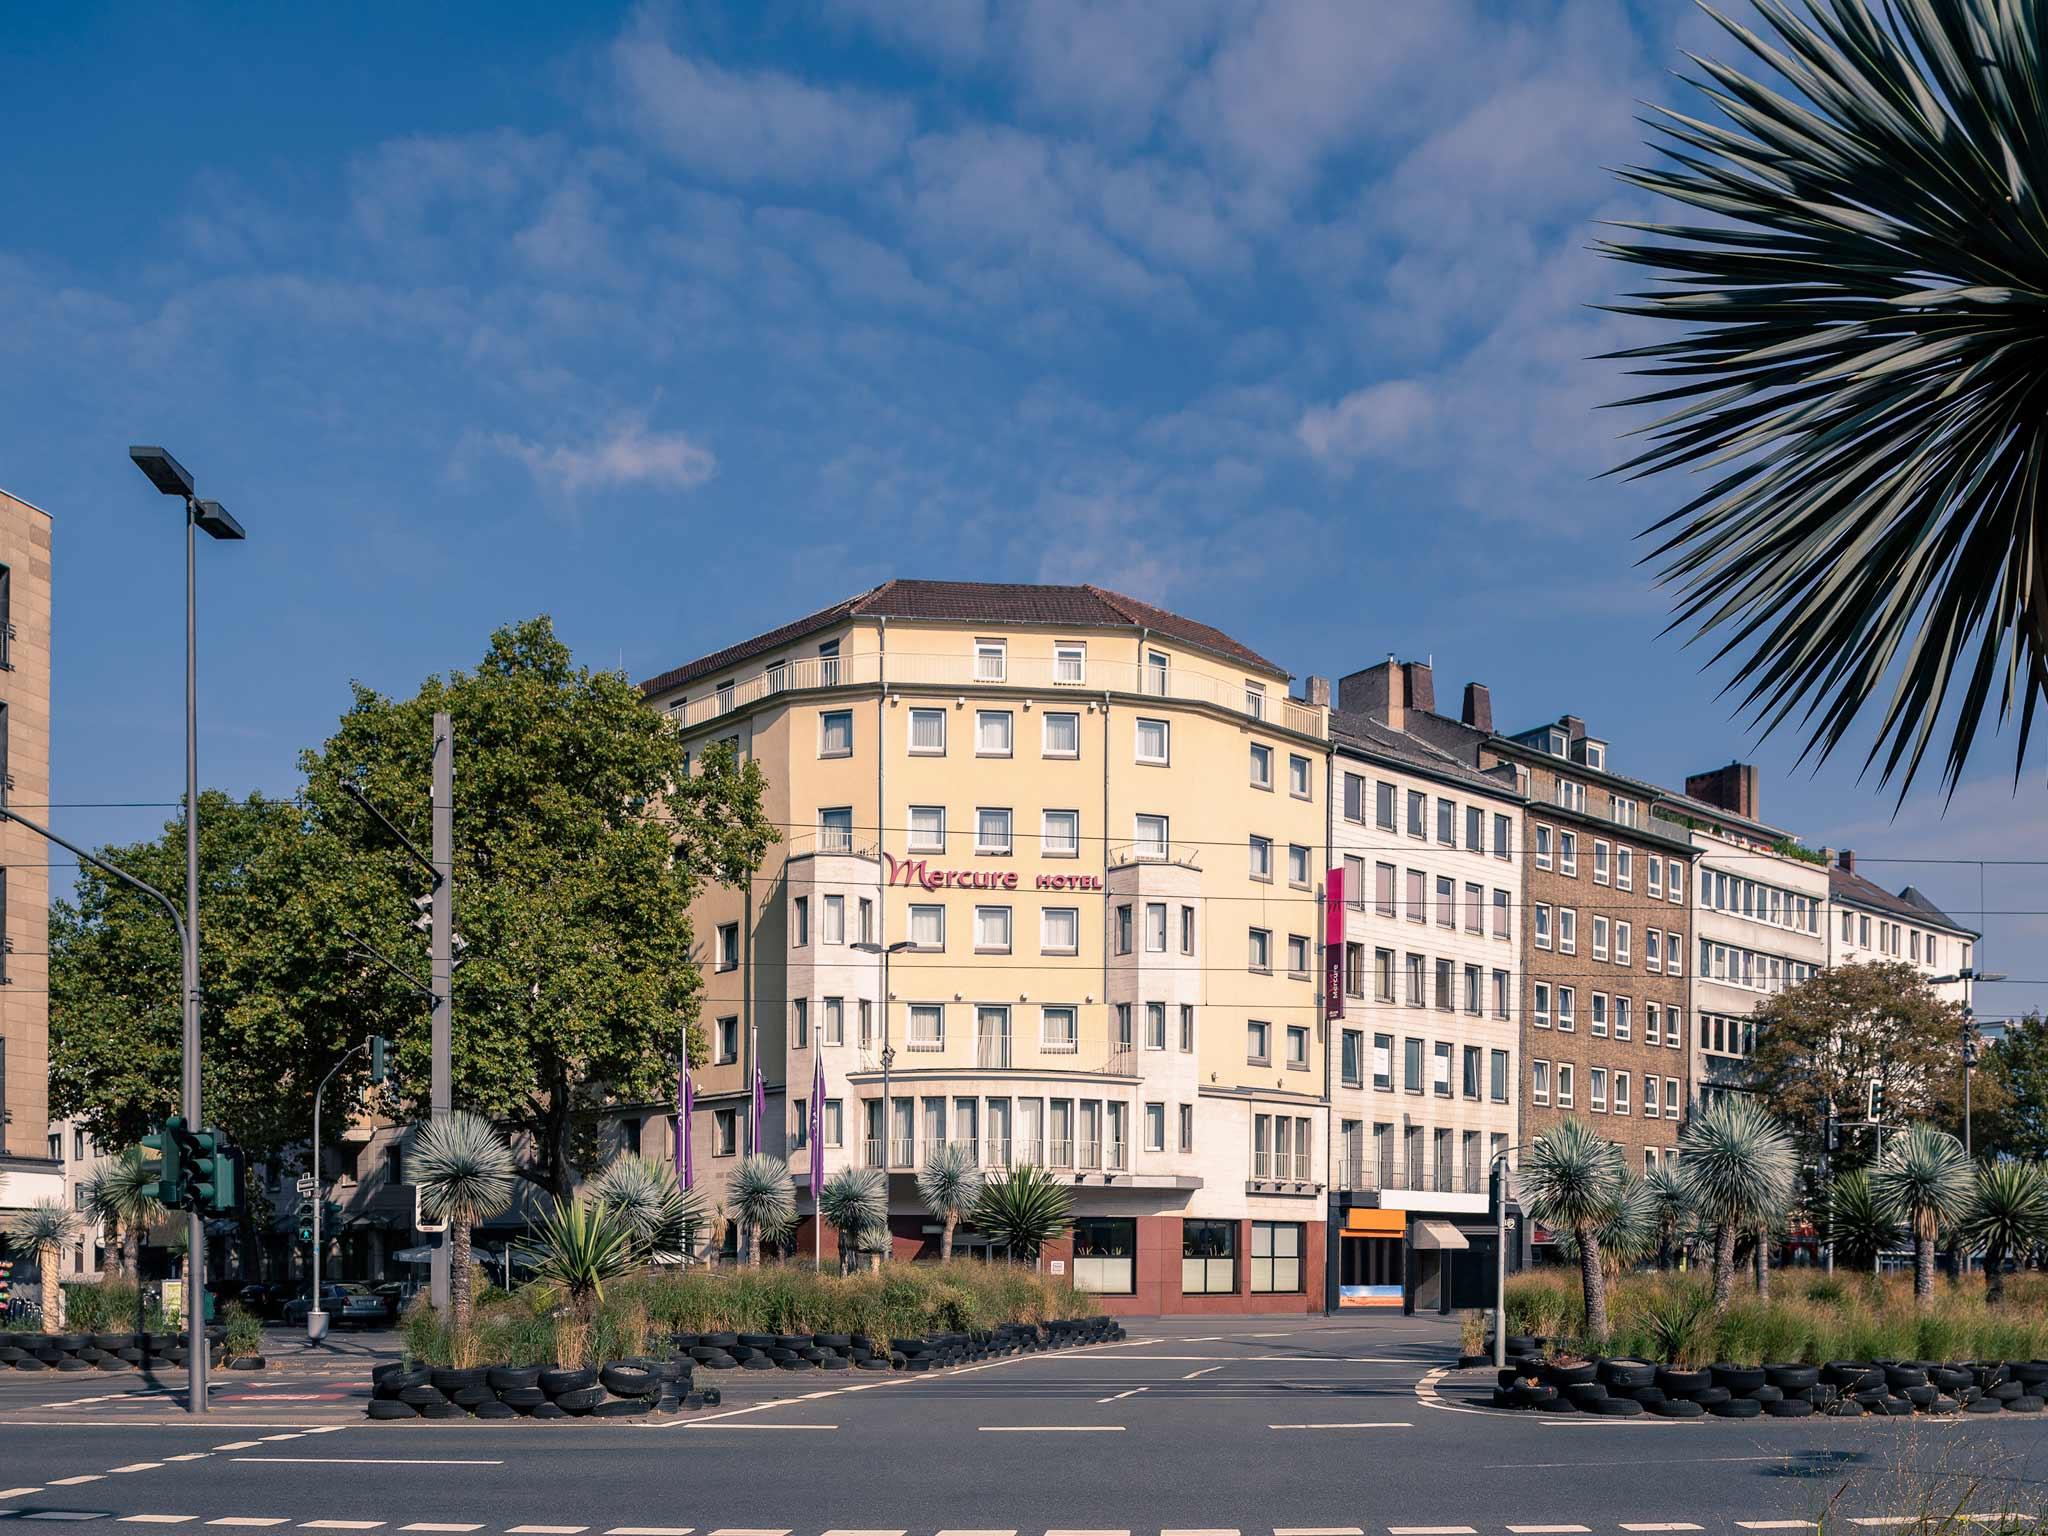 Hotel - Mercure Hotel Duesseldorf City Center